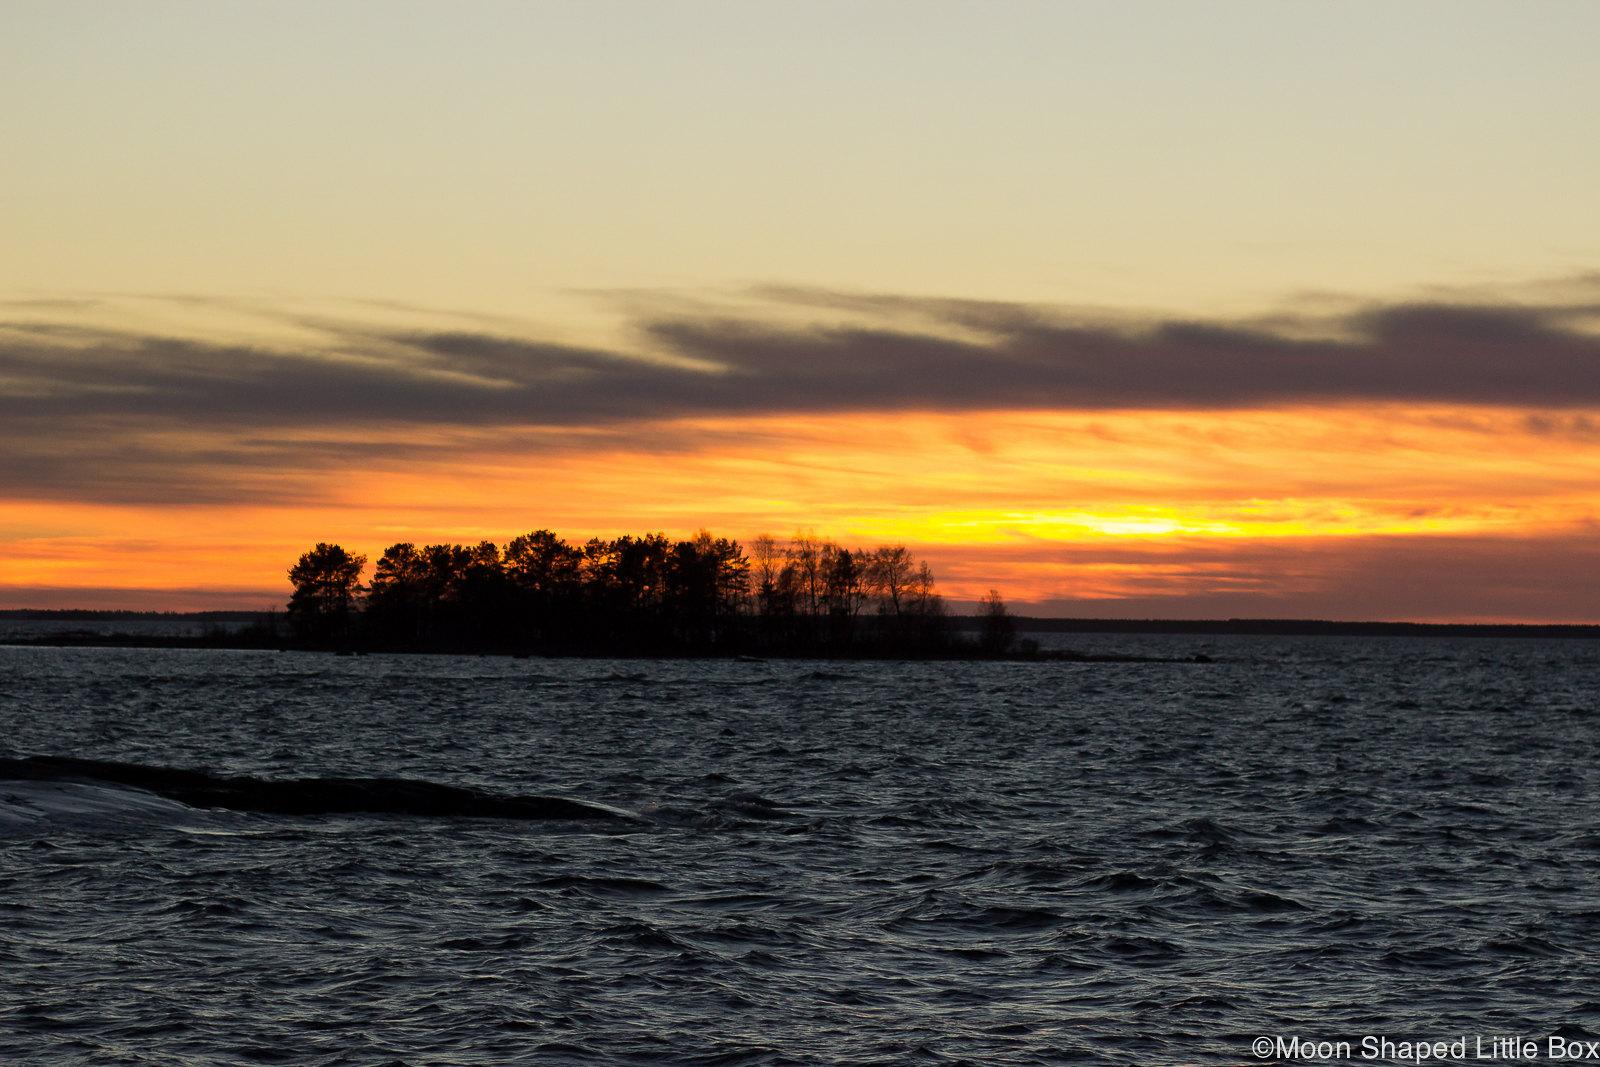 Fäboda, Pietarsaari, Jakobstad, november 2018, auringonlasku merellä, auringonlasku